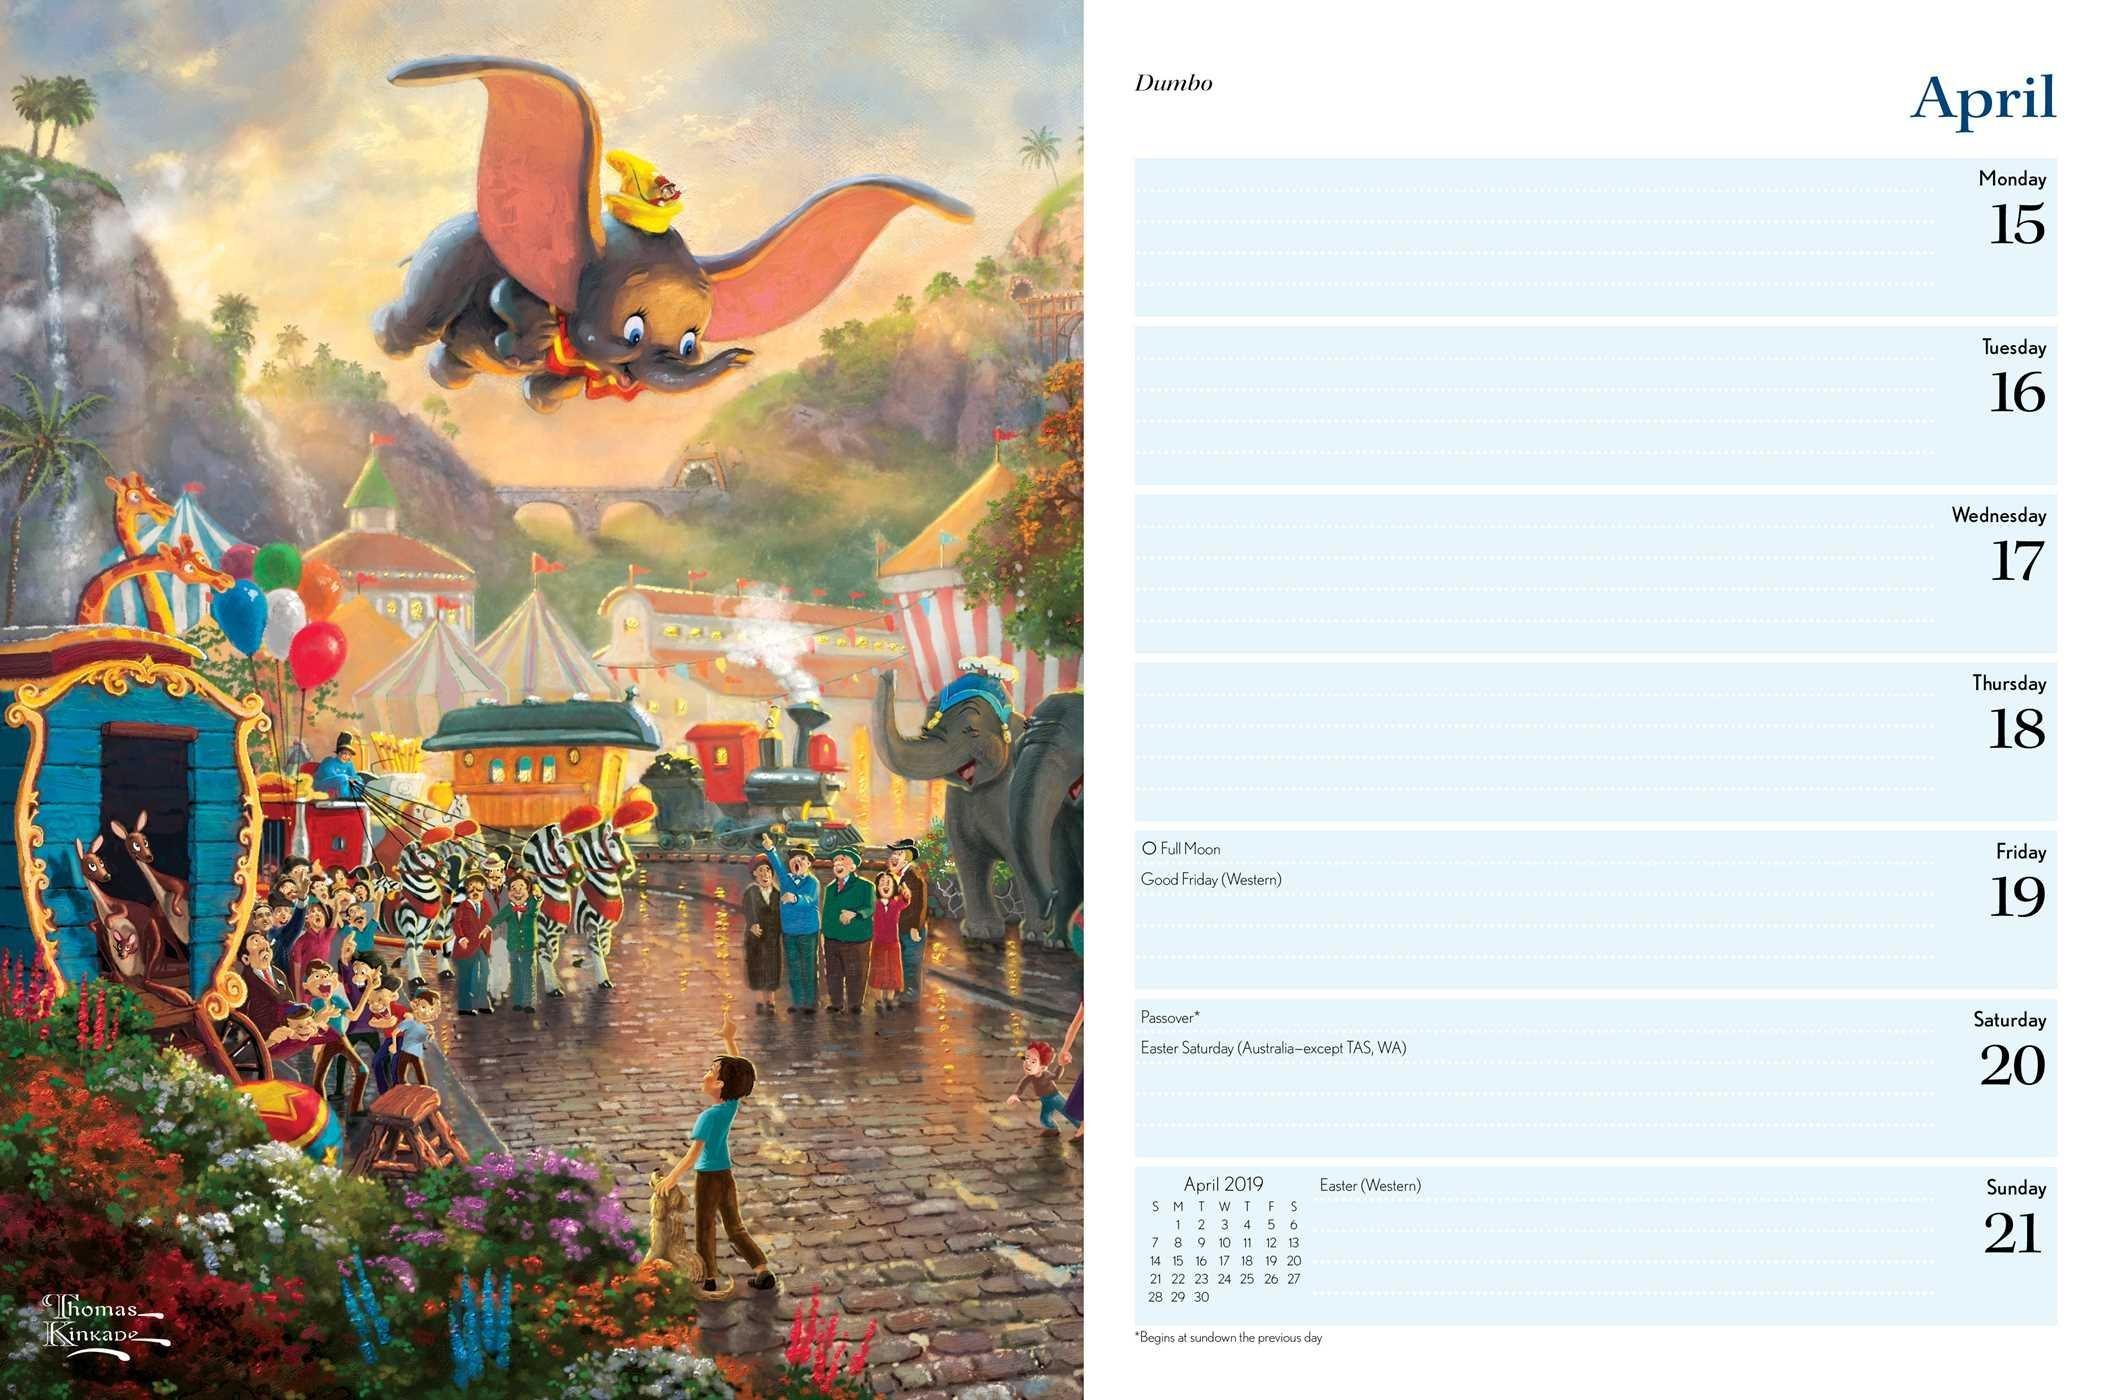 Disney Dreams Collection 2019 Engagement Calendar – Disneyland.shopping Calendar 2019 Thomas Kinkade